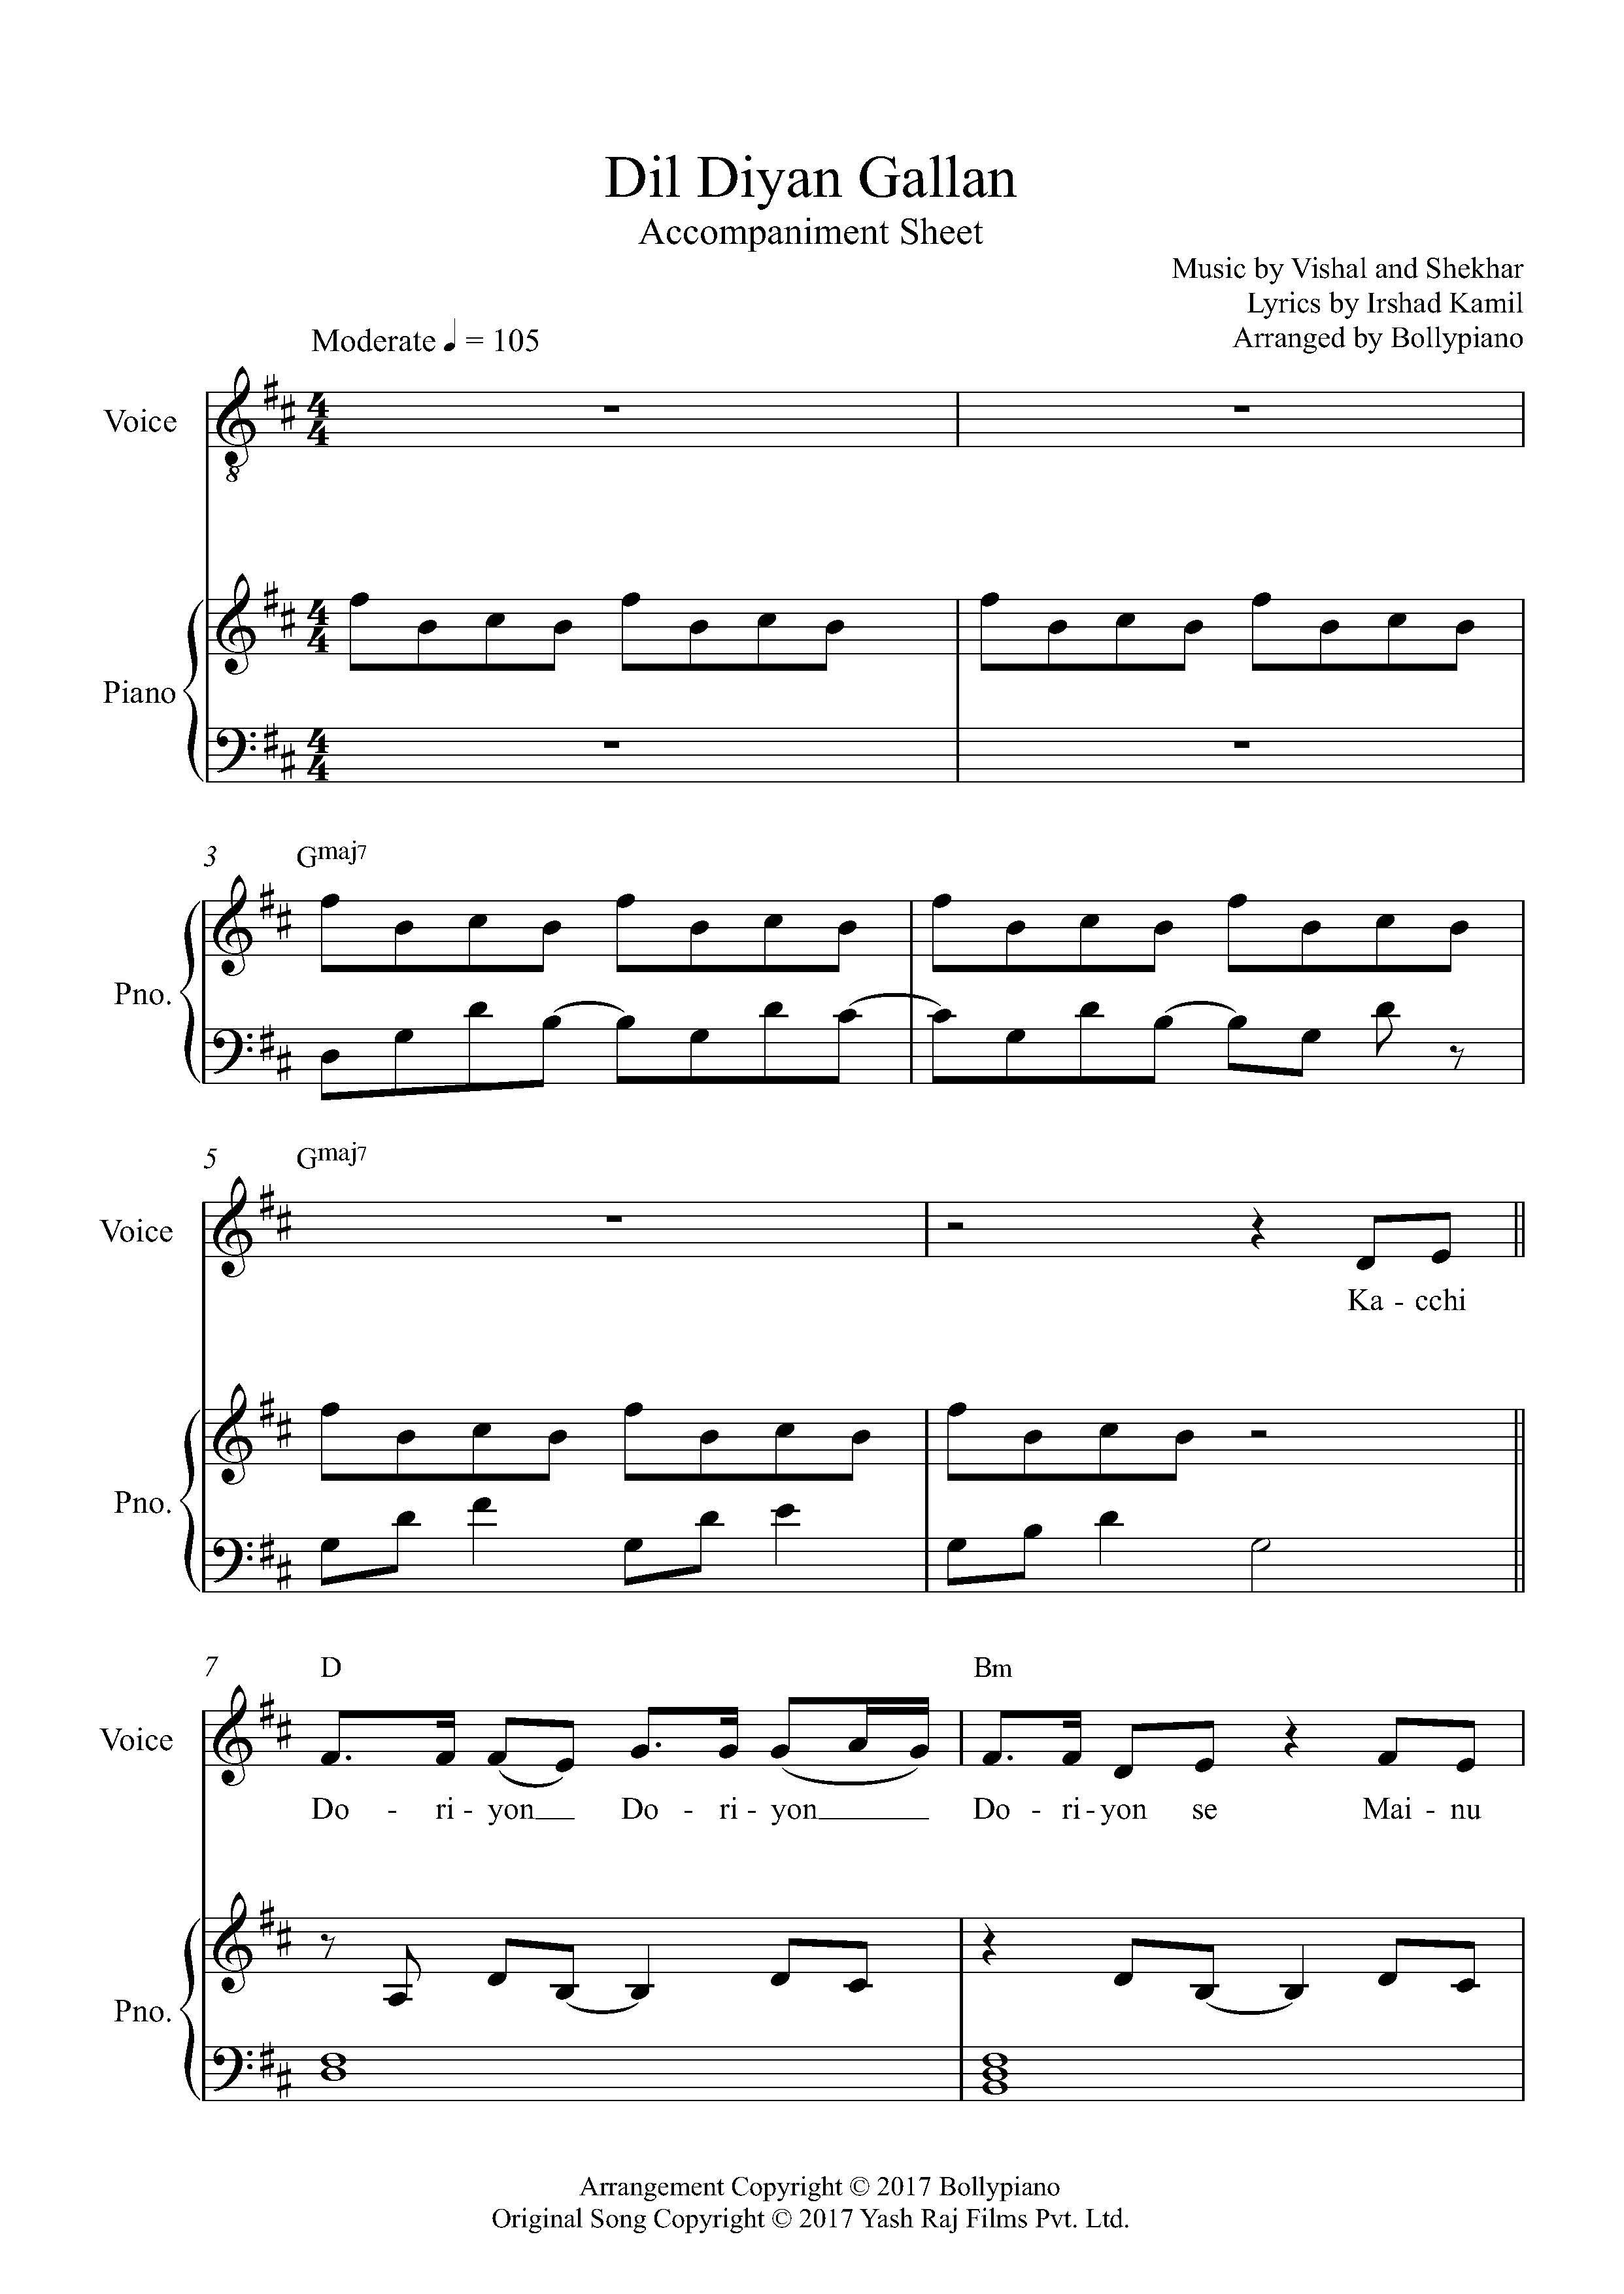 Details Ins Dil Diyan Gallan Lyrics — Mailstump